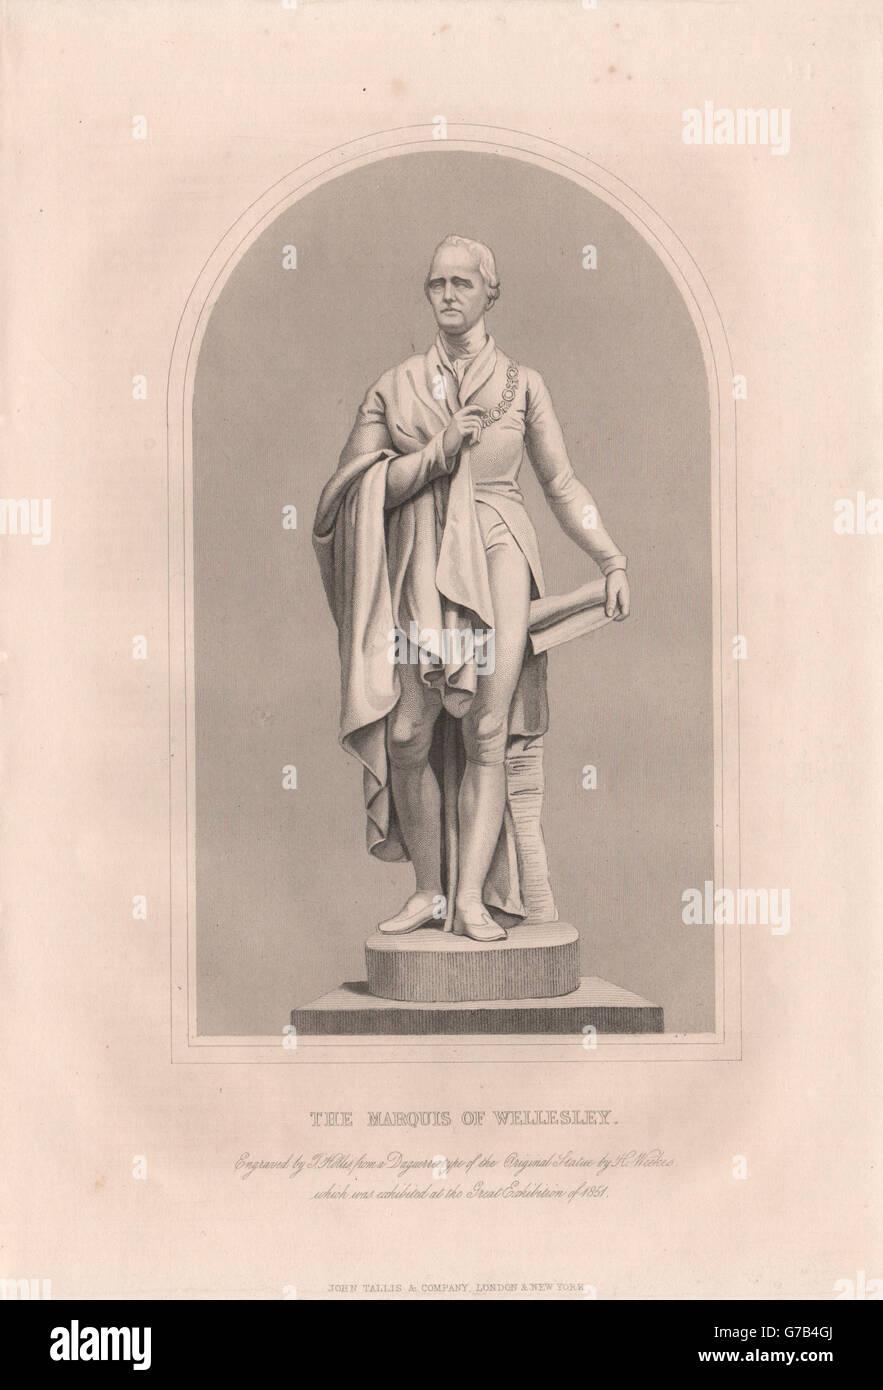 The Marquis of Wellesley. Ireland. TALLIS, antique print 1853 - Stock Image